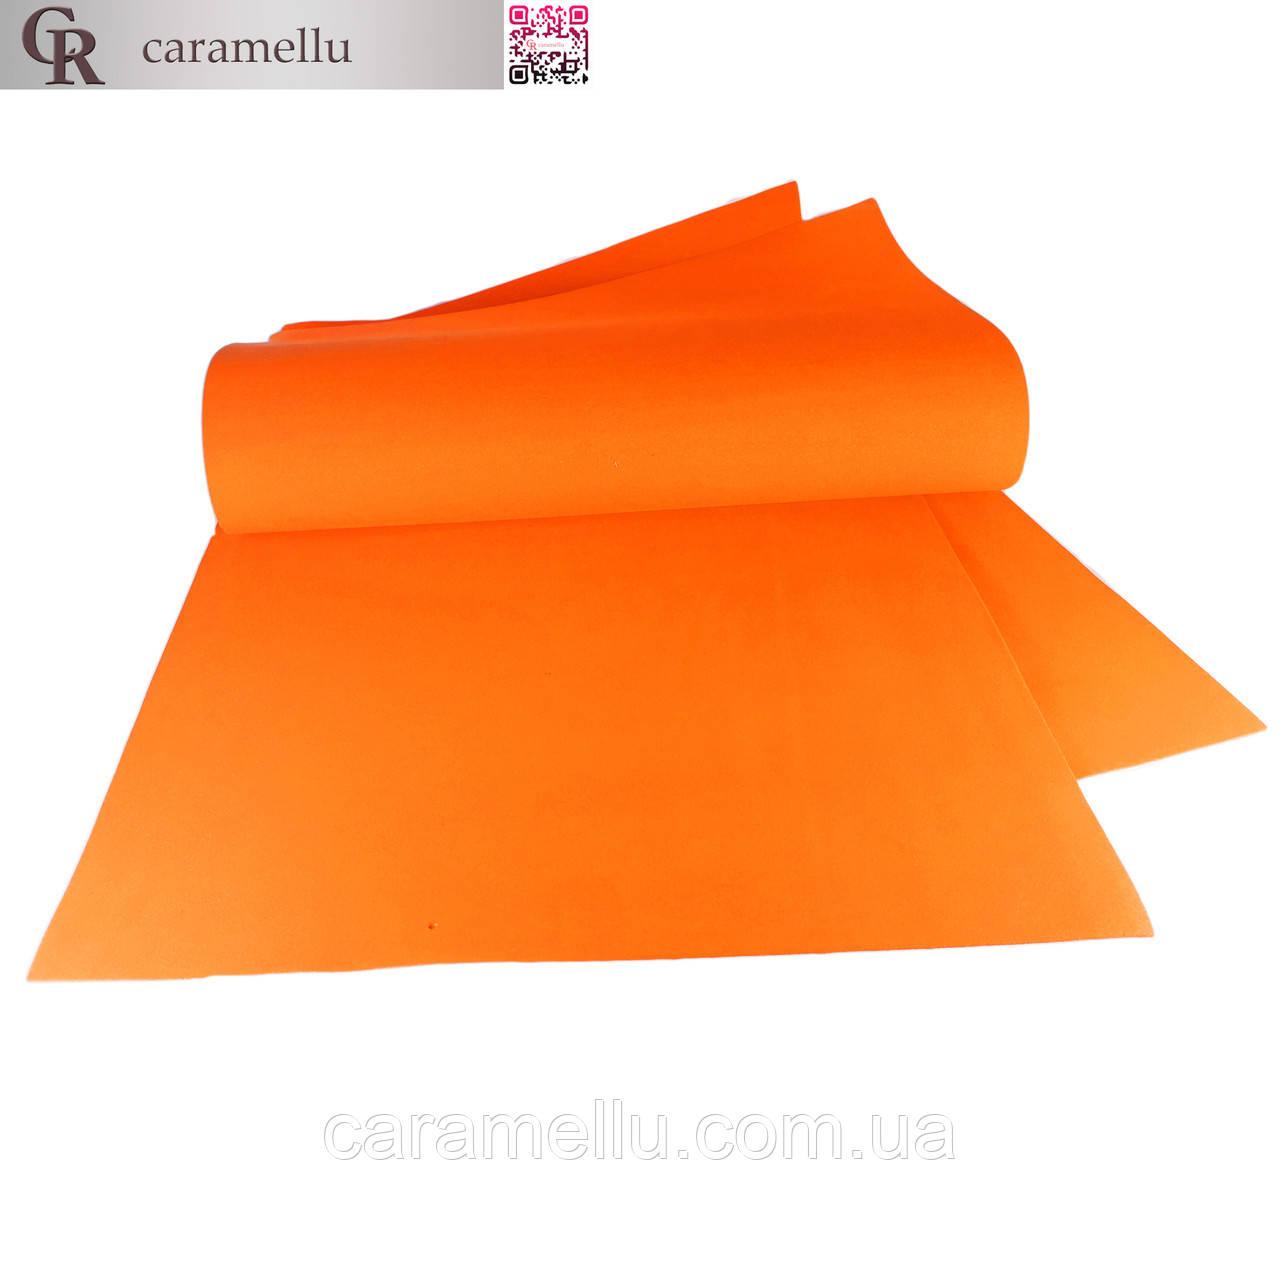 Фоамиран иранский 125, Оранжевый, 1мм,  70х60см.